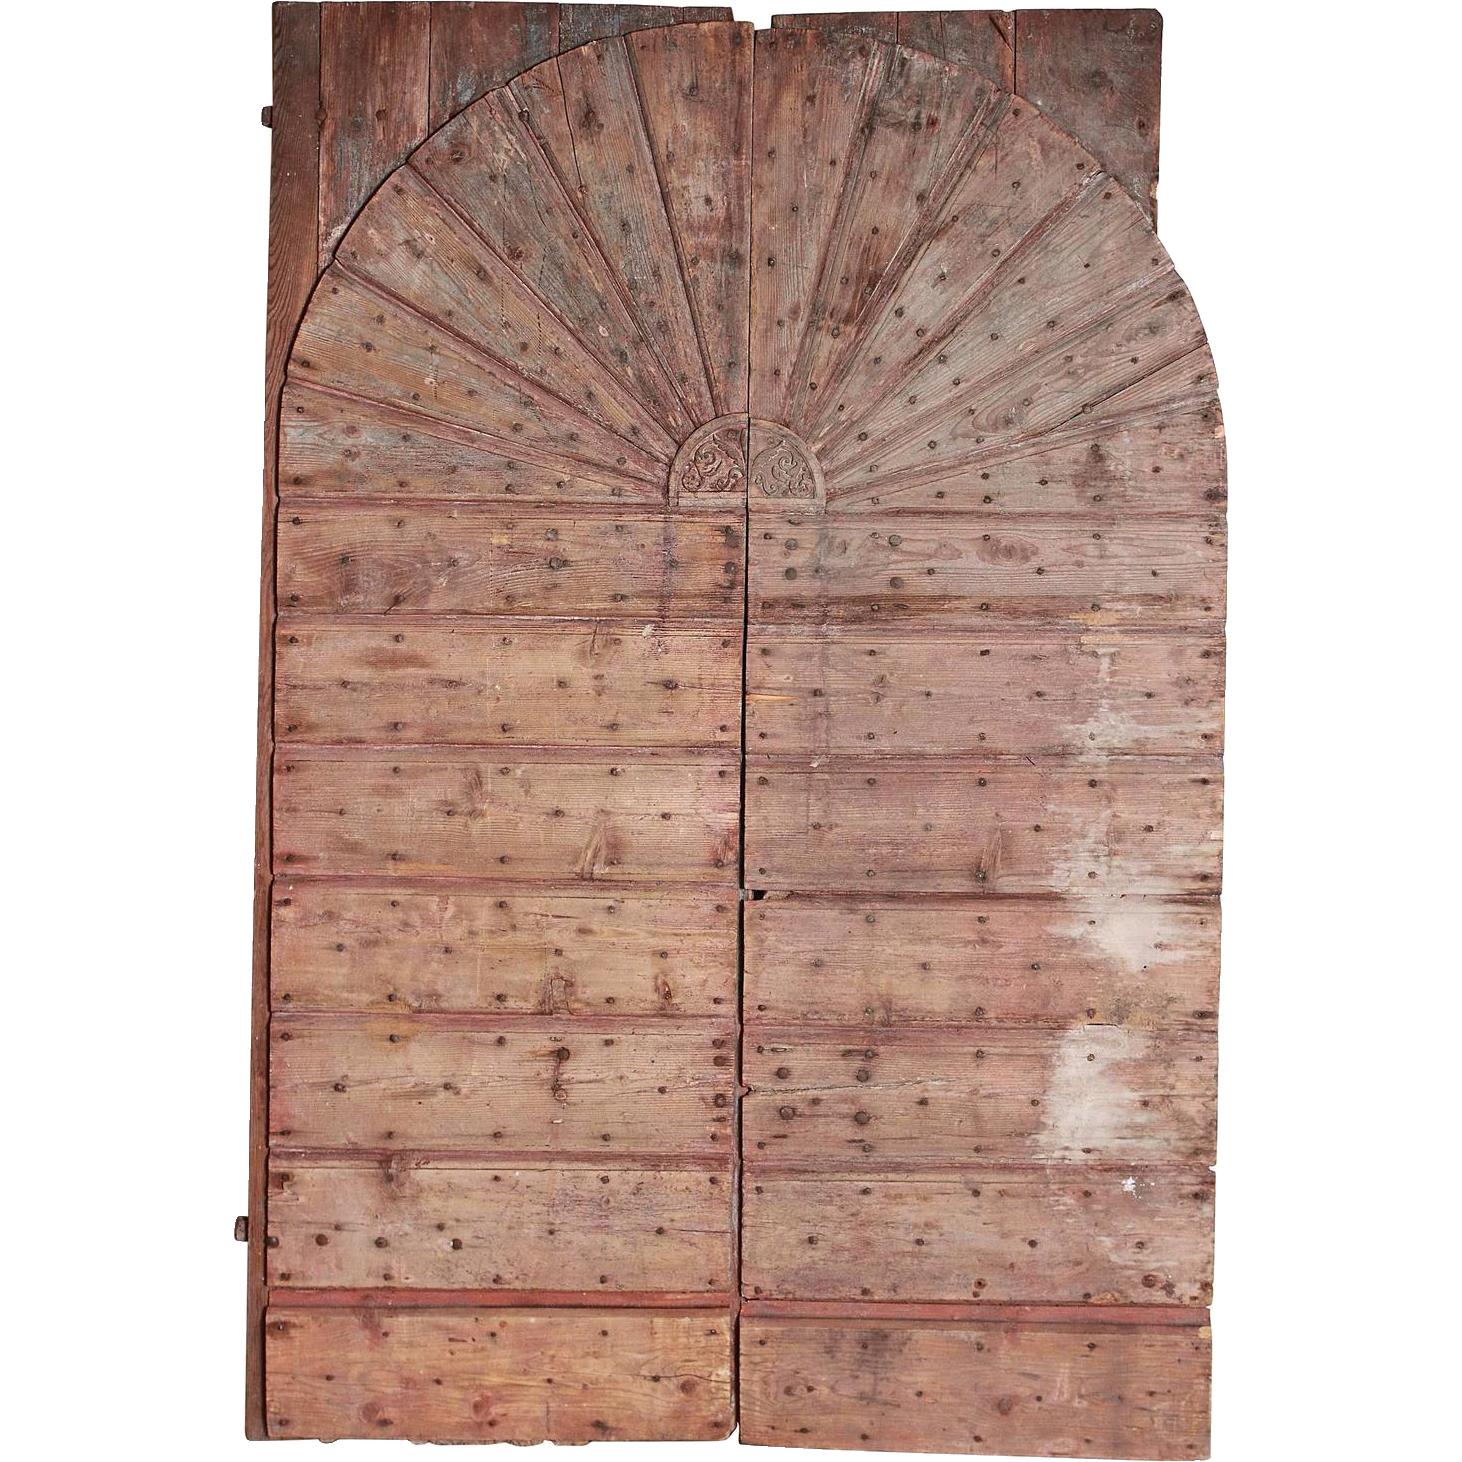 Pair of Large 18th Century Farm Doors from Belluno Italy